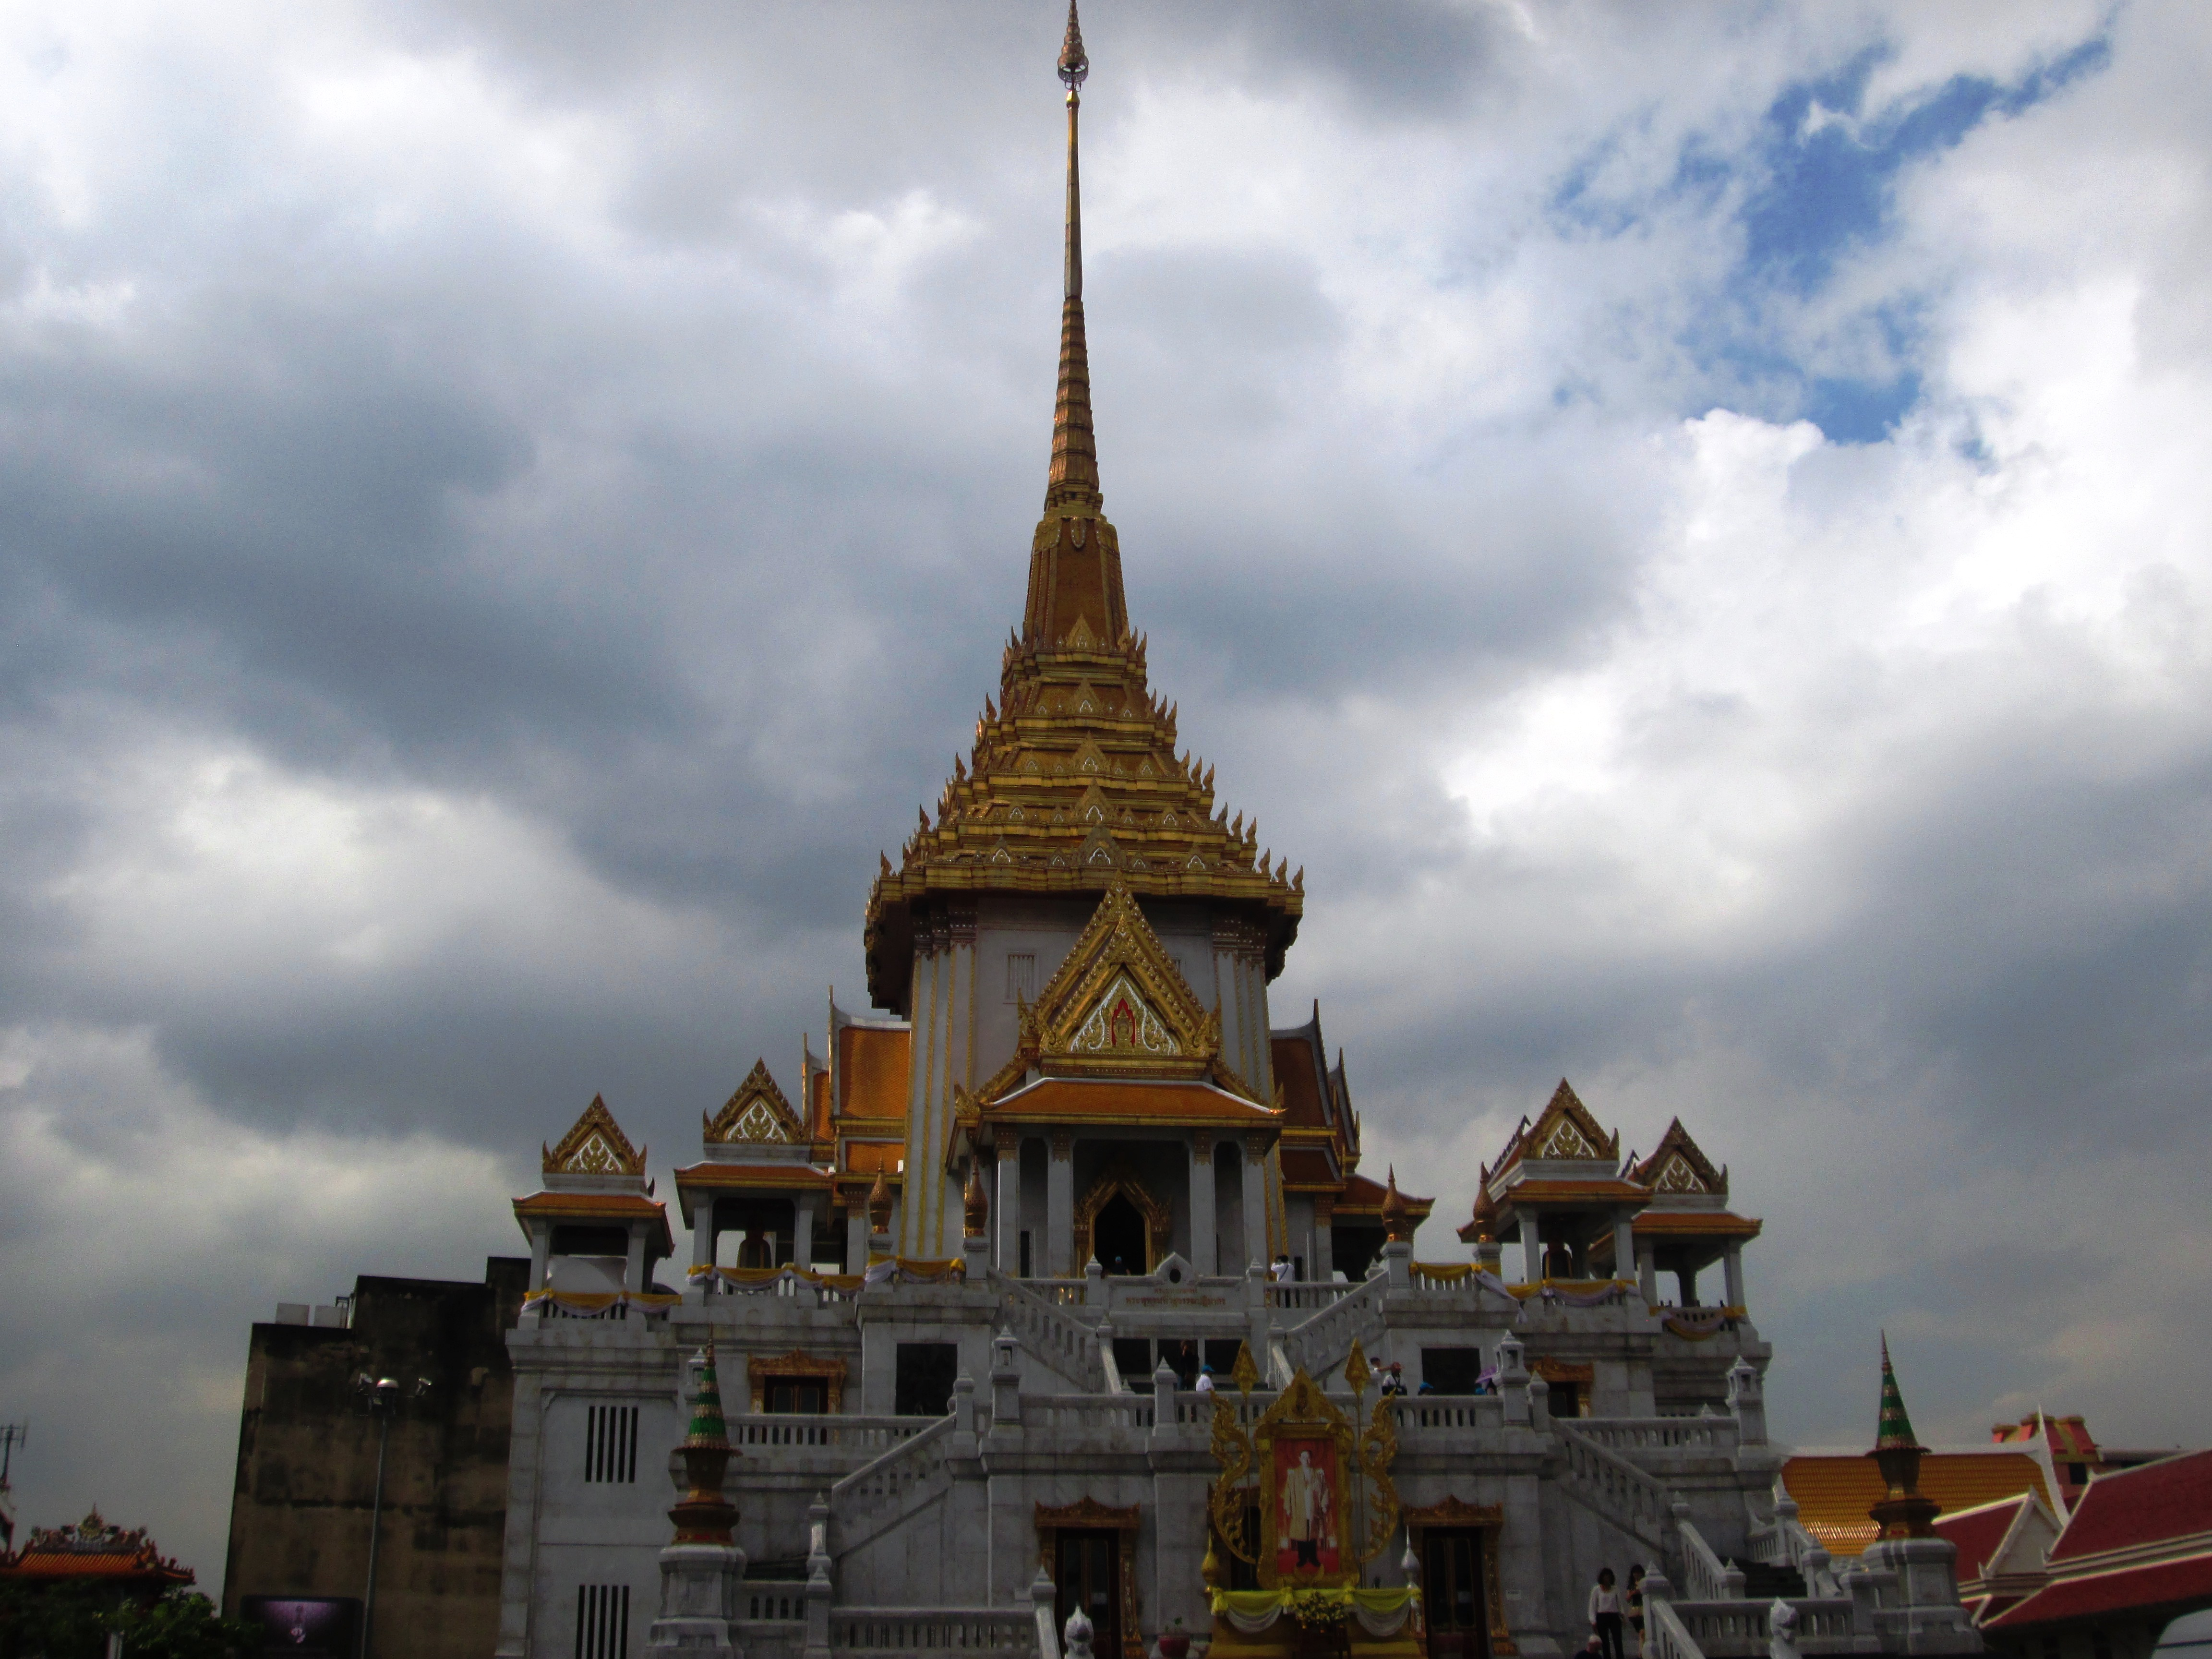 Bangkok_Chinatown_Wat Traimit1.jpg